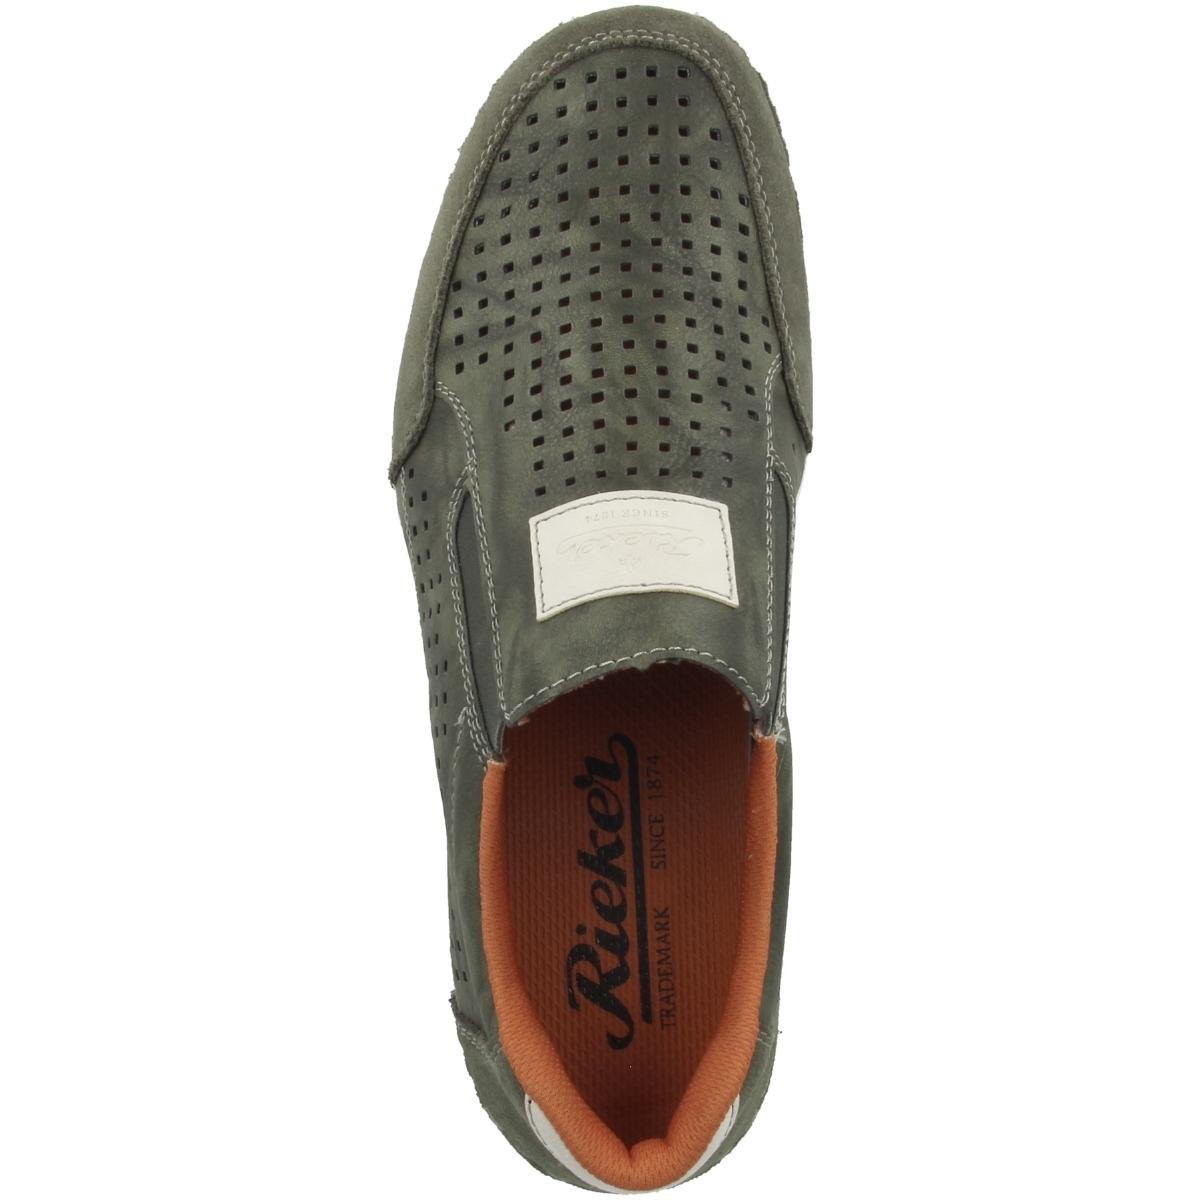 Rieker B9266-56 Schuhe Herren Antistress Freizeit Sneaker Halbschuhe Slipper